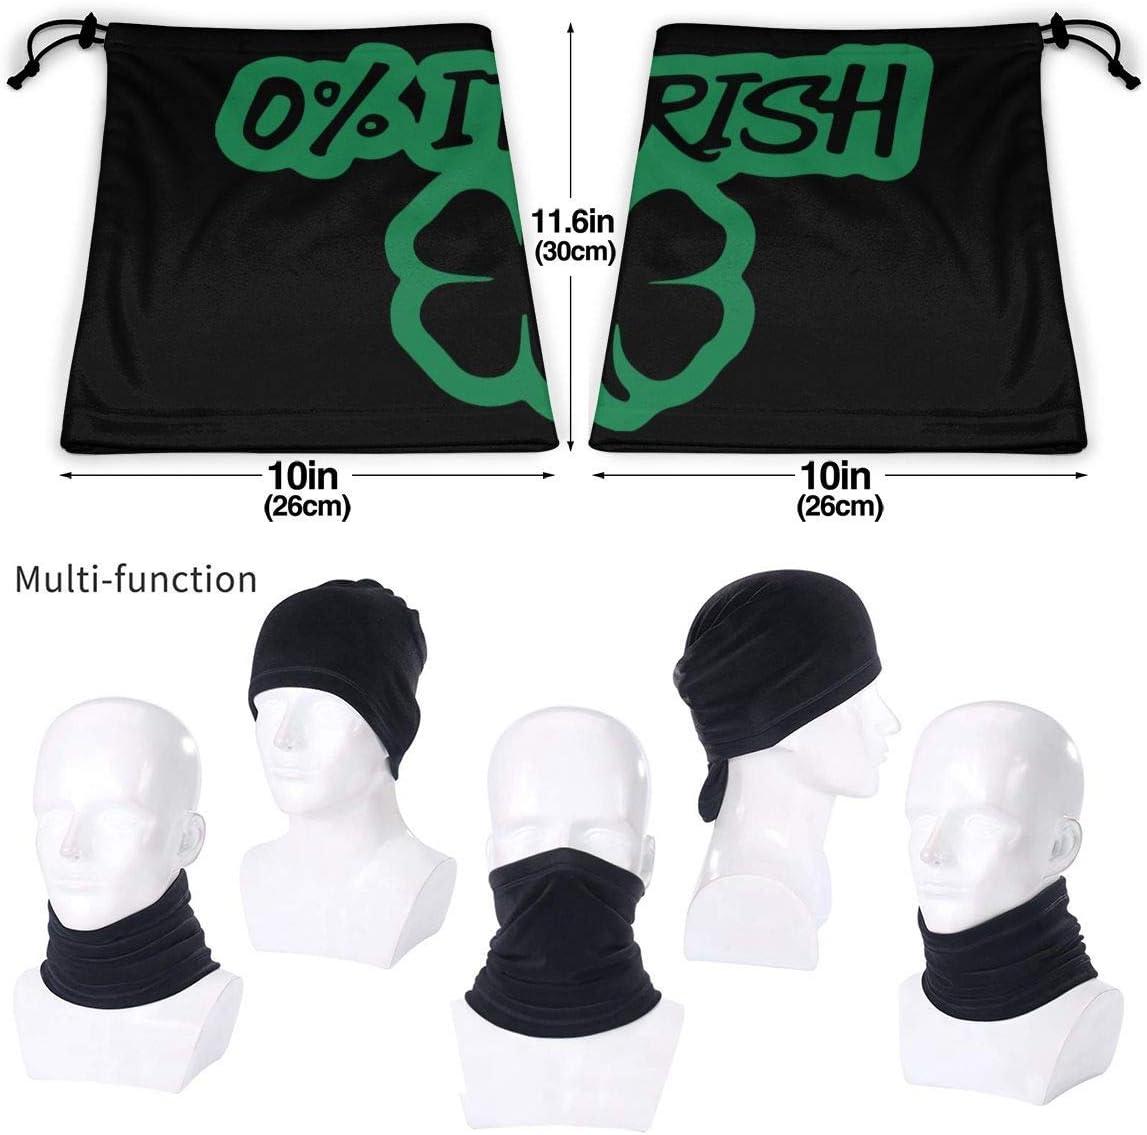 for Mens Womens Zcfhike 0 Percent Irish Microfiber Polyester Seamless Windproof Bandana /& Face Mask /& Neck Warmer Gaiter Shield